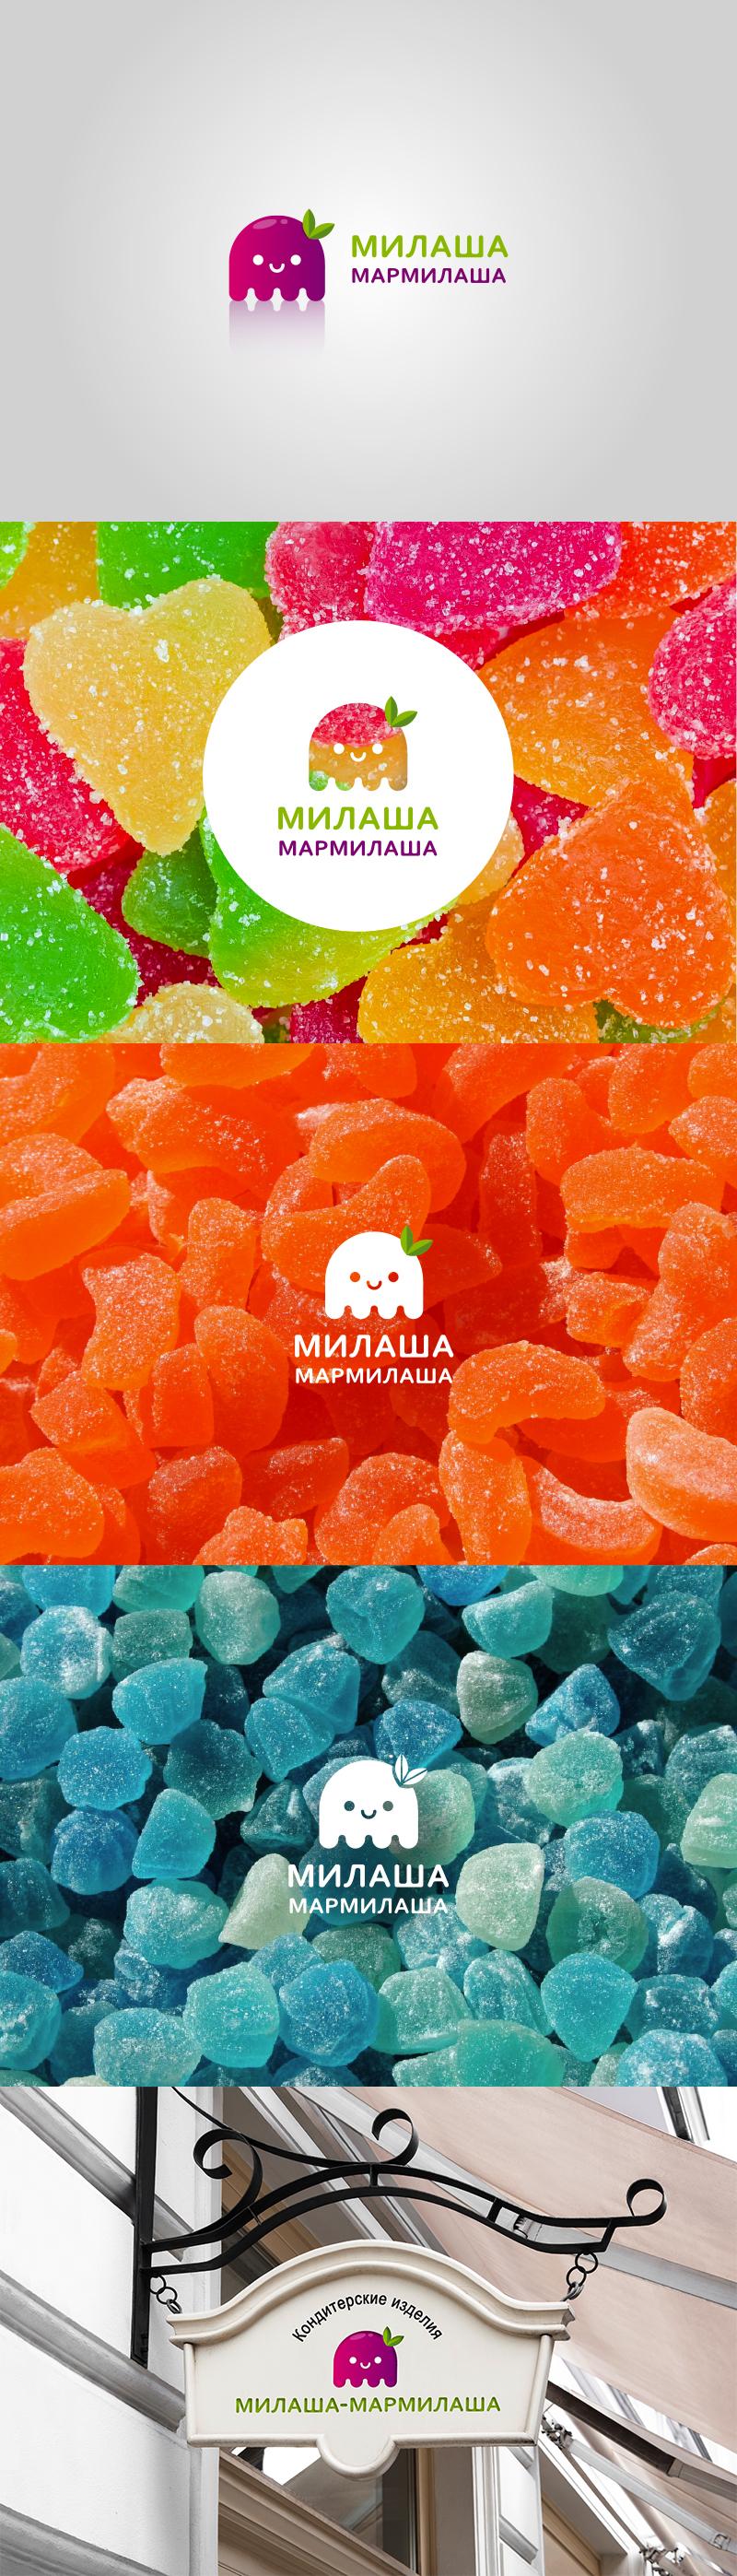 "Логотип для товарного знака ""Милаша-Мармилаша"" фото f_865587e6e03c670d.jpg"